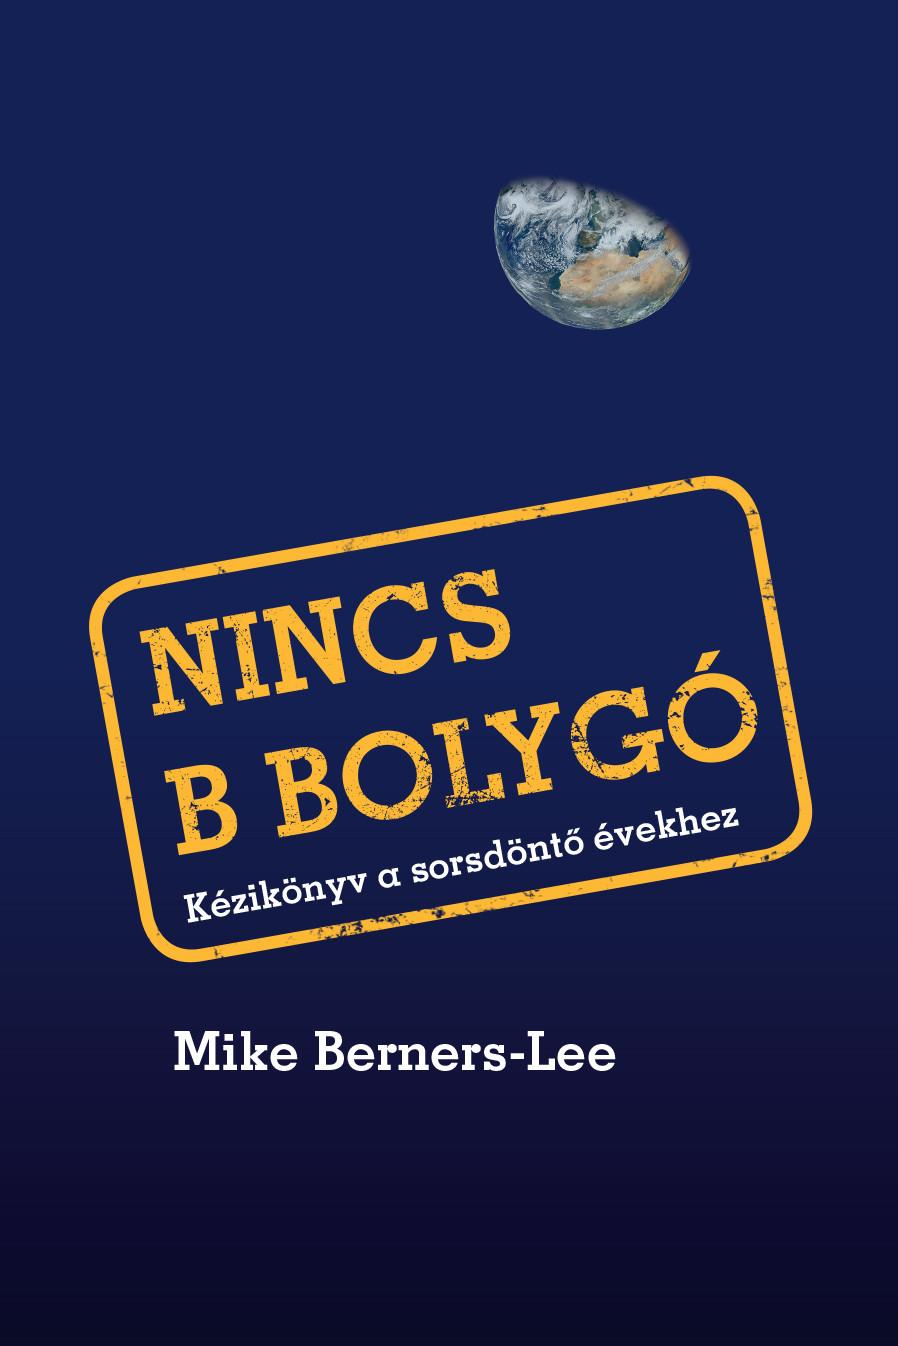 A Nincs B bolygó c. könyv borítója